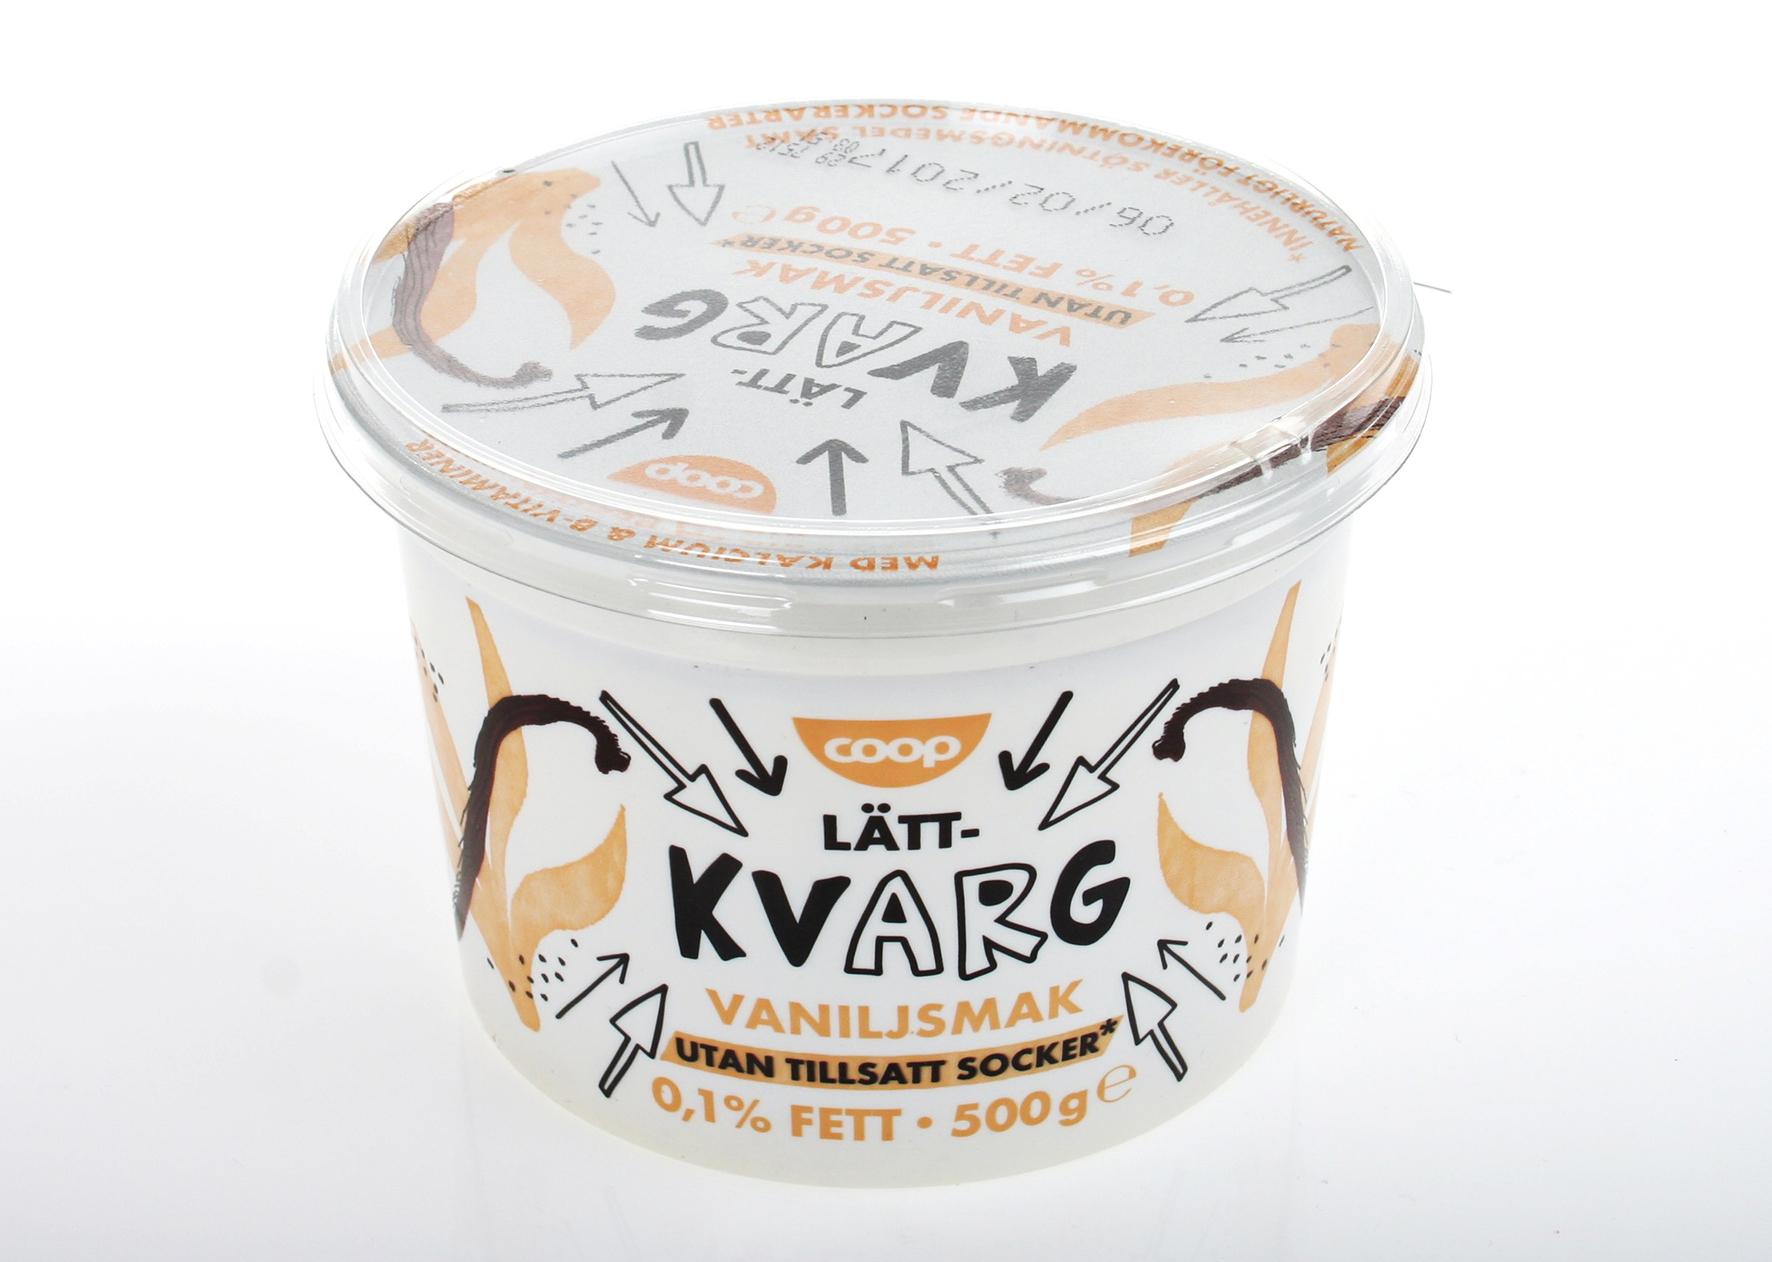 coop kvarg vanilj